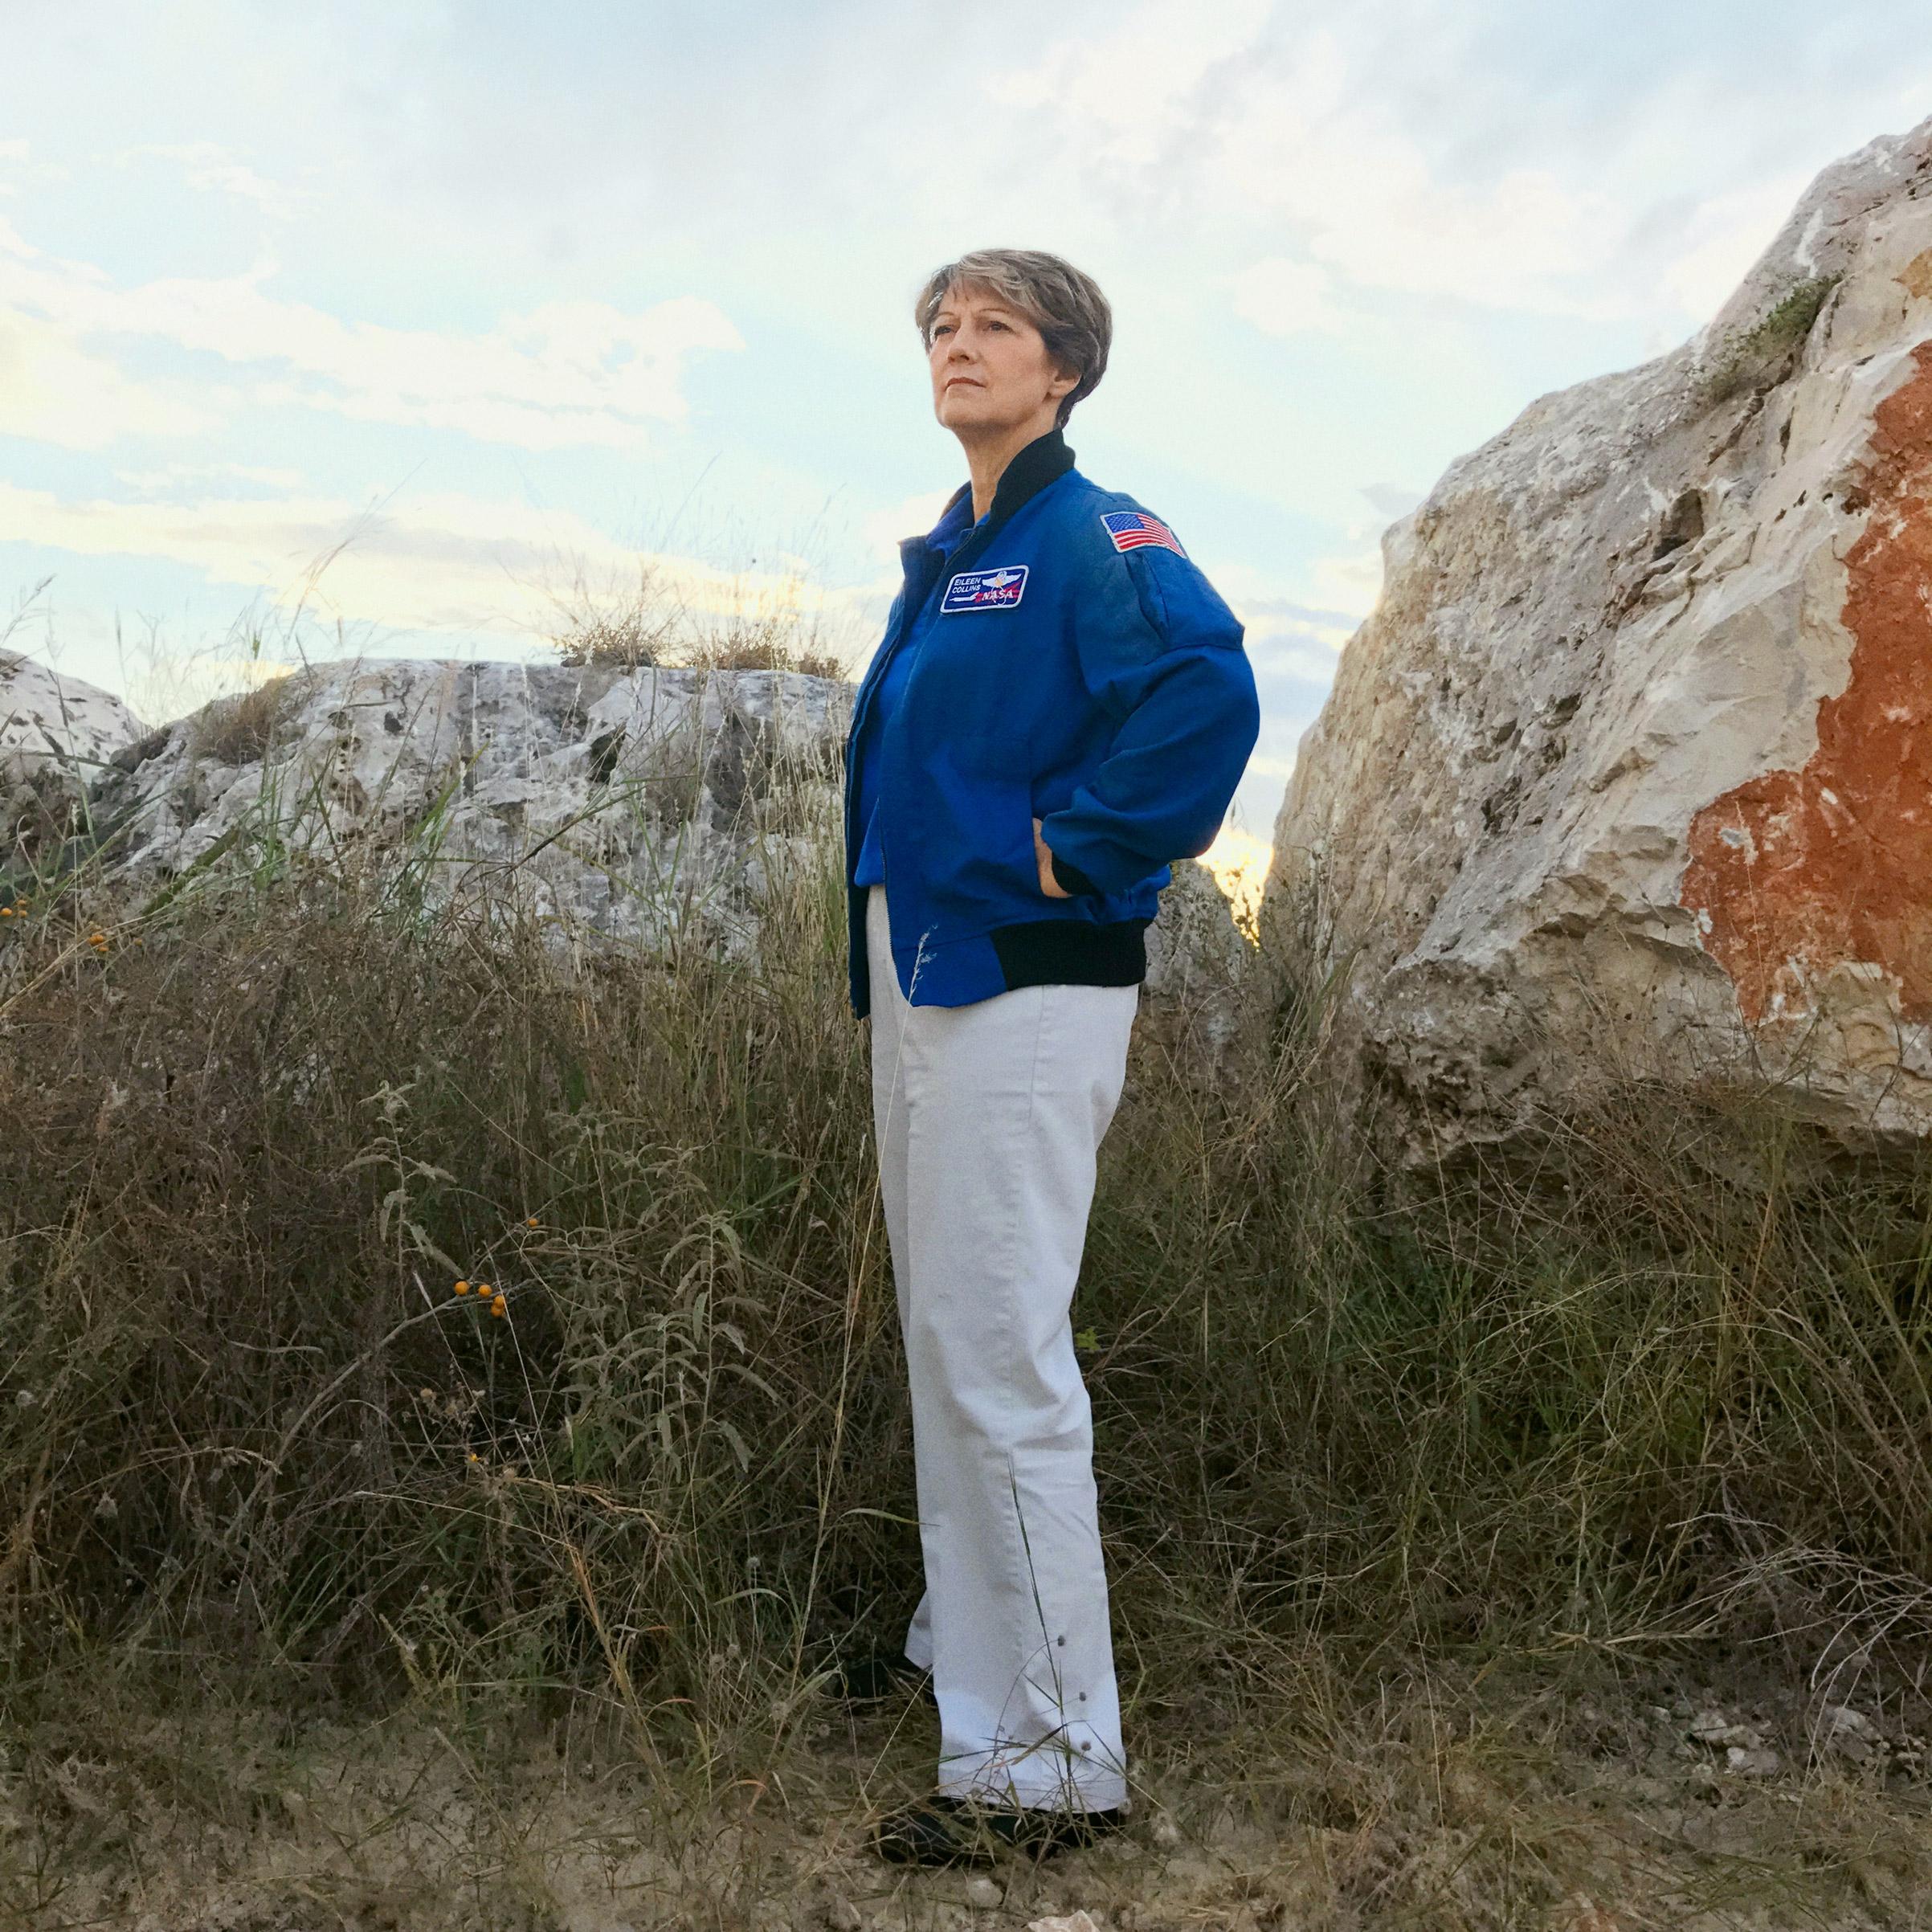 Portrait of Eileen Collins, photographed in San Antonio, TX, November 3, 2016.